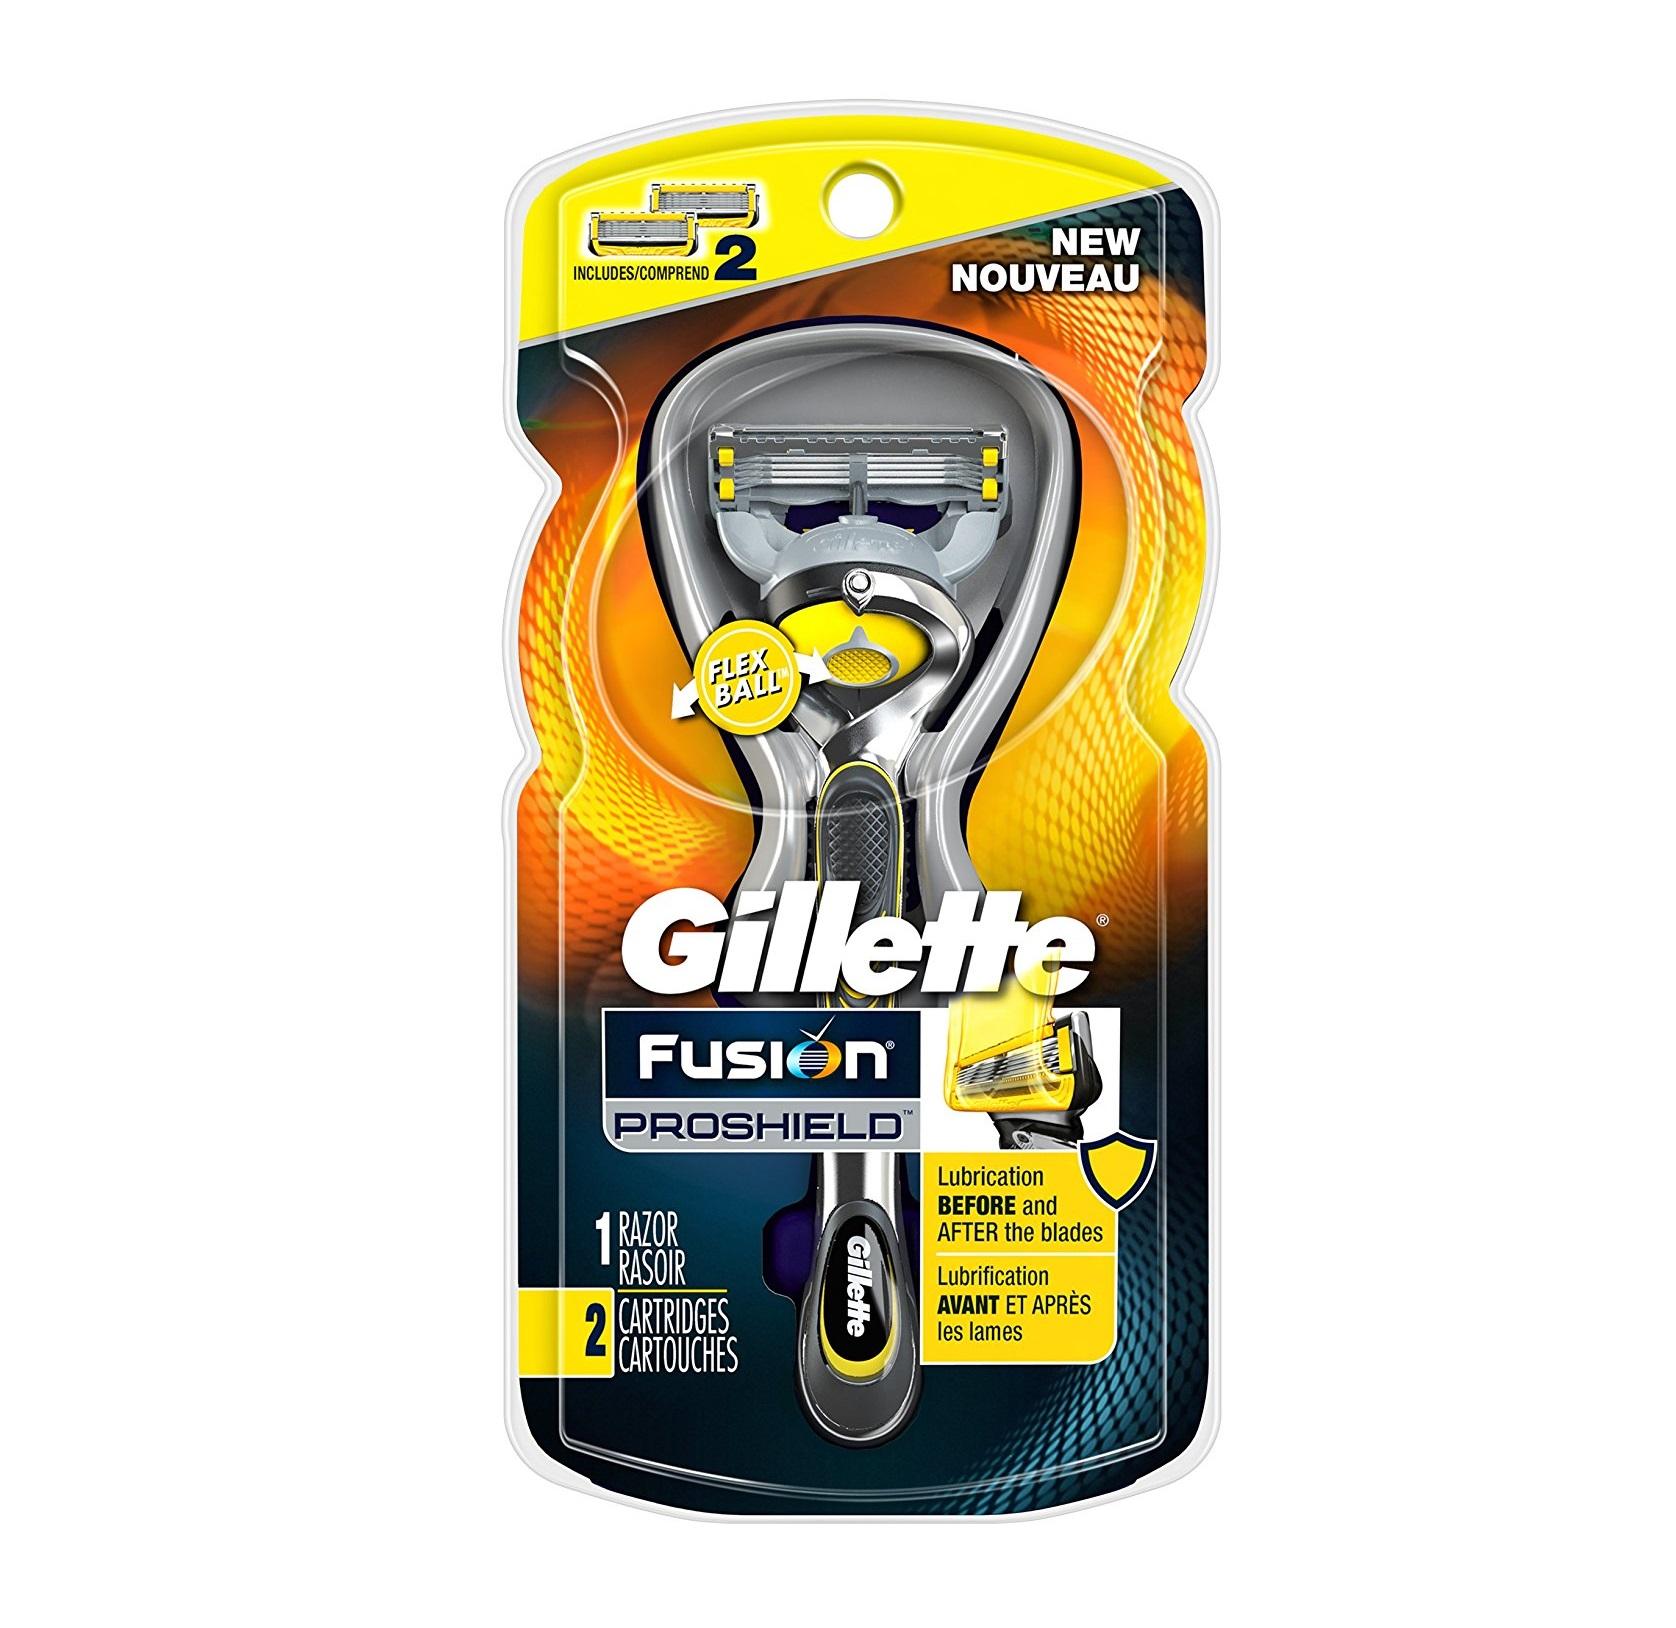 Gillette Fusion ProShield Men's Razor with Flexball Handle